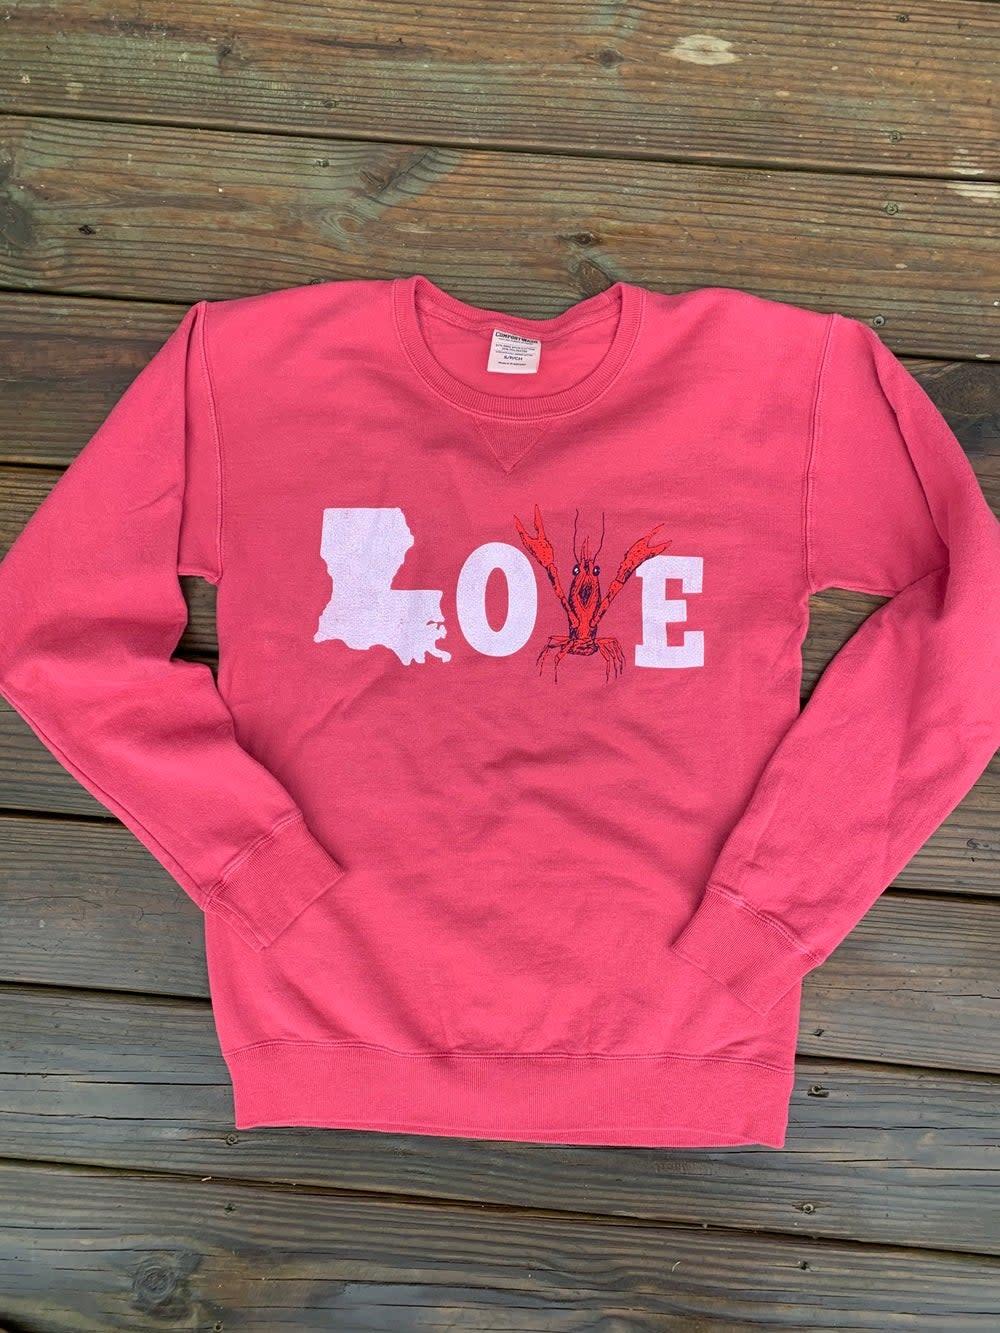 Mr Ps Tees Adult LOVE Crawfish Sweatshirt